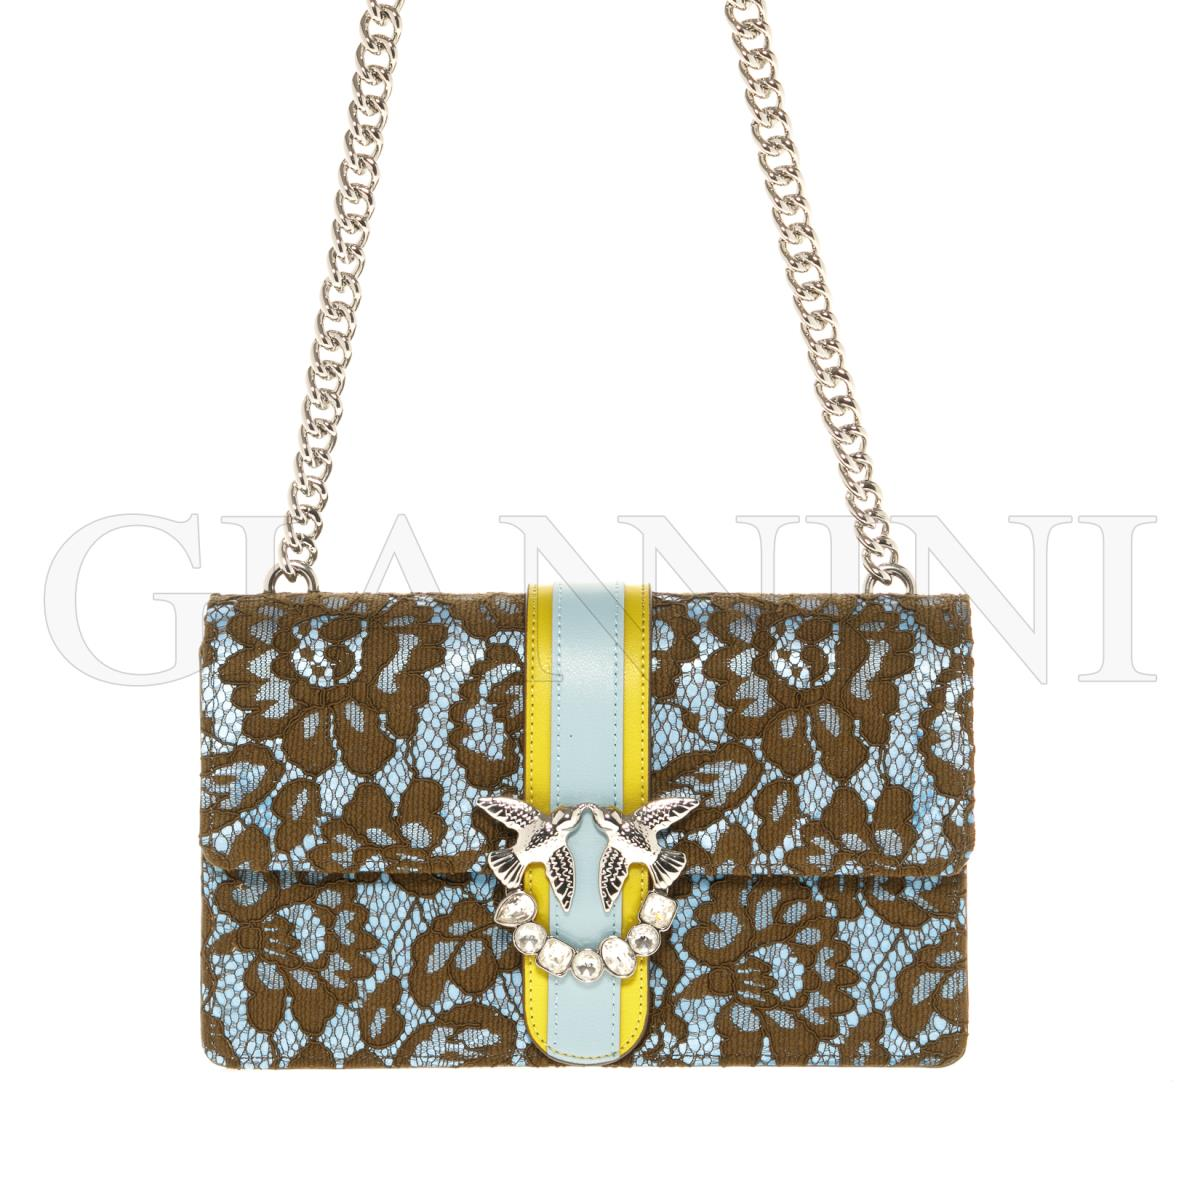 4a3efbf2afc PINKO Crossbody bag LOVE LACE for Women   GianniniShopOnline.com